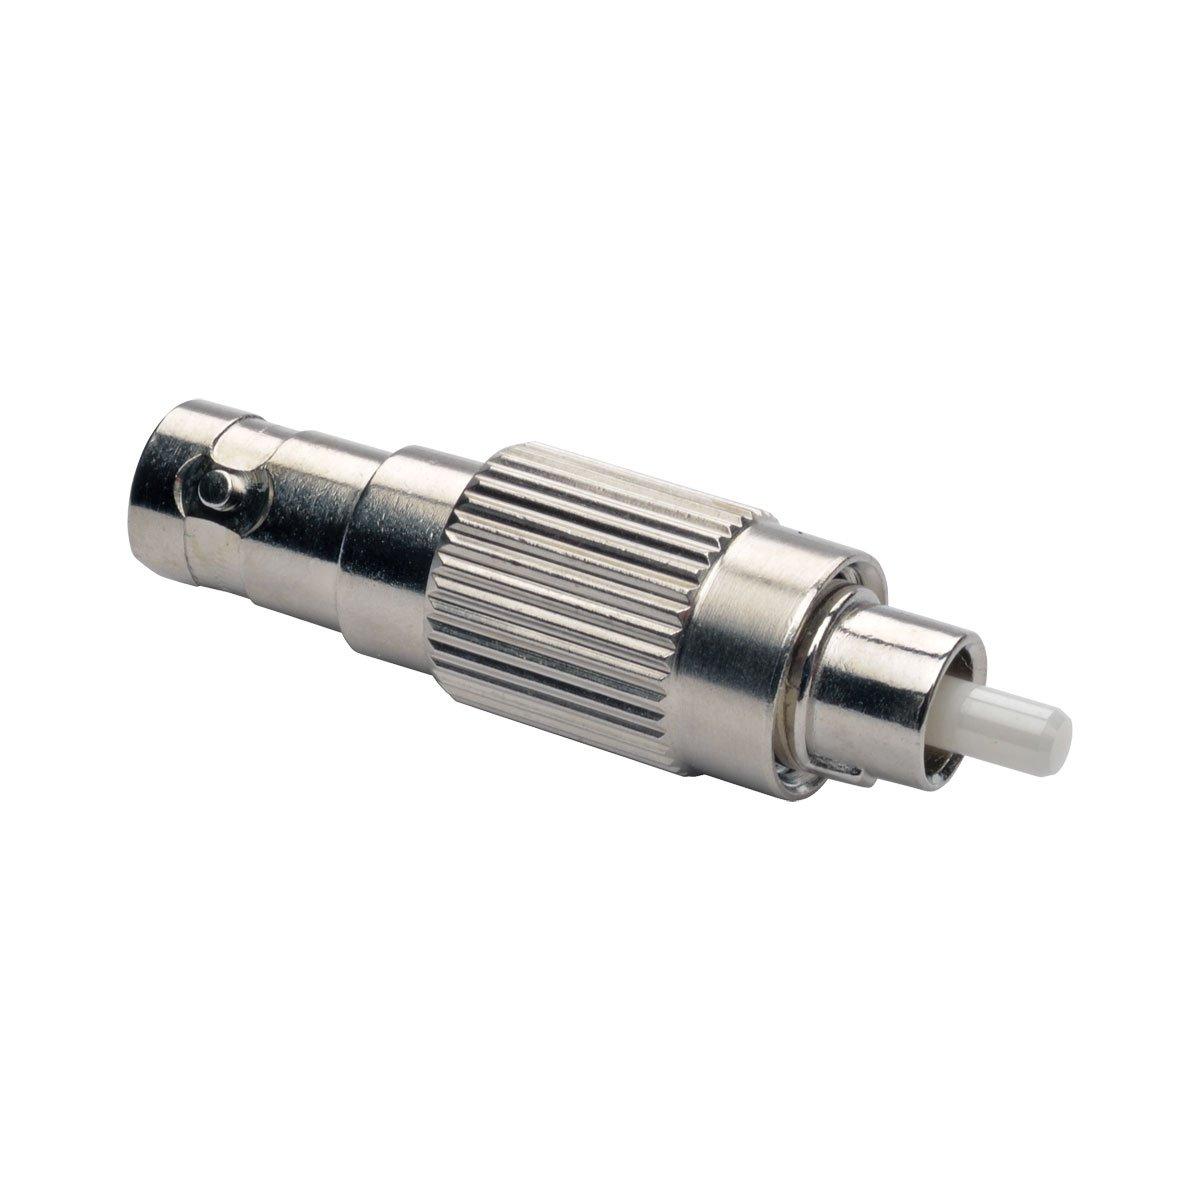 Tripp Lite Optical Fiber Cable Tester Adapter FC/ST 9/125 M/F (T020-001-ST9)